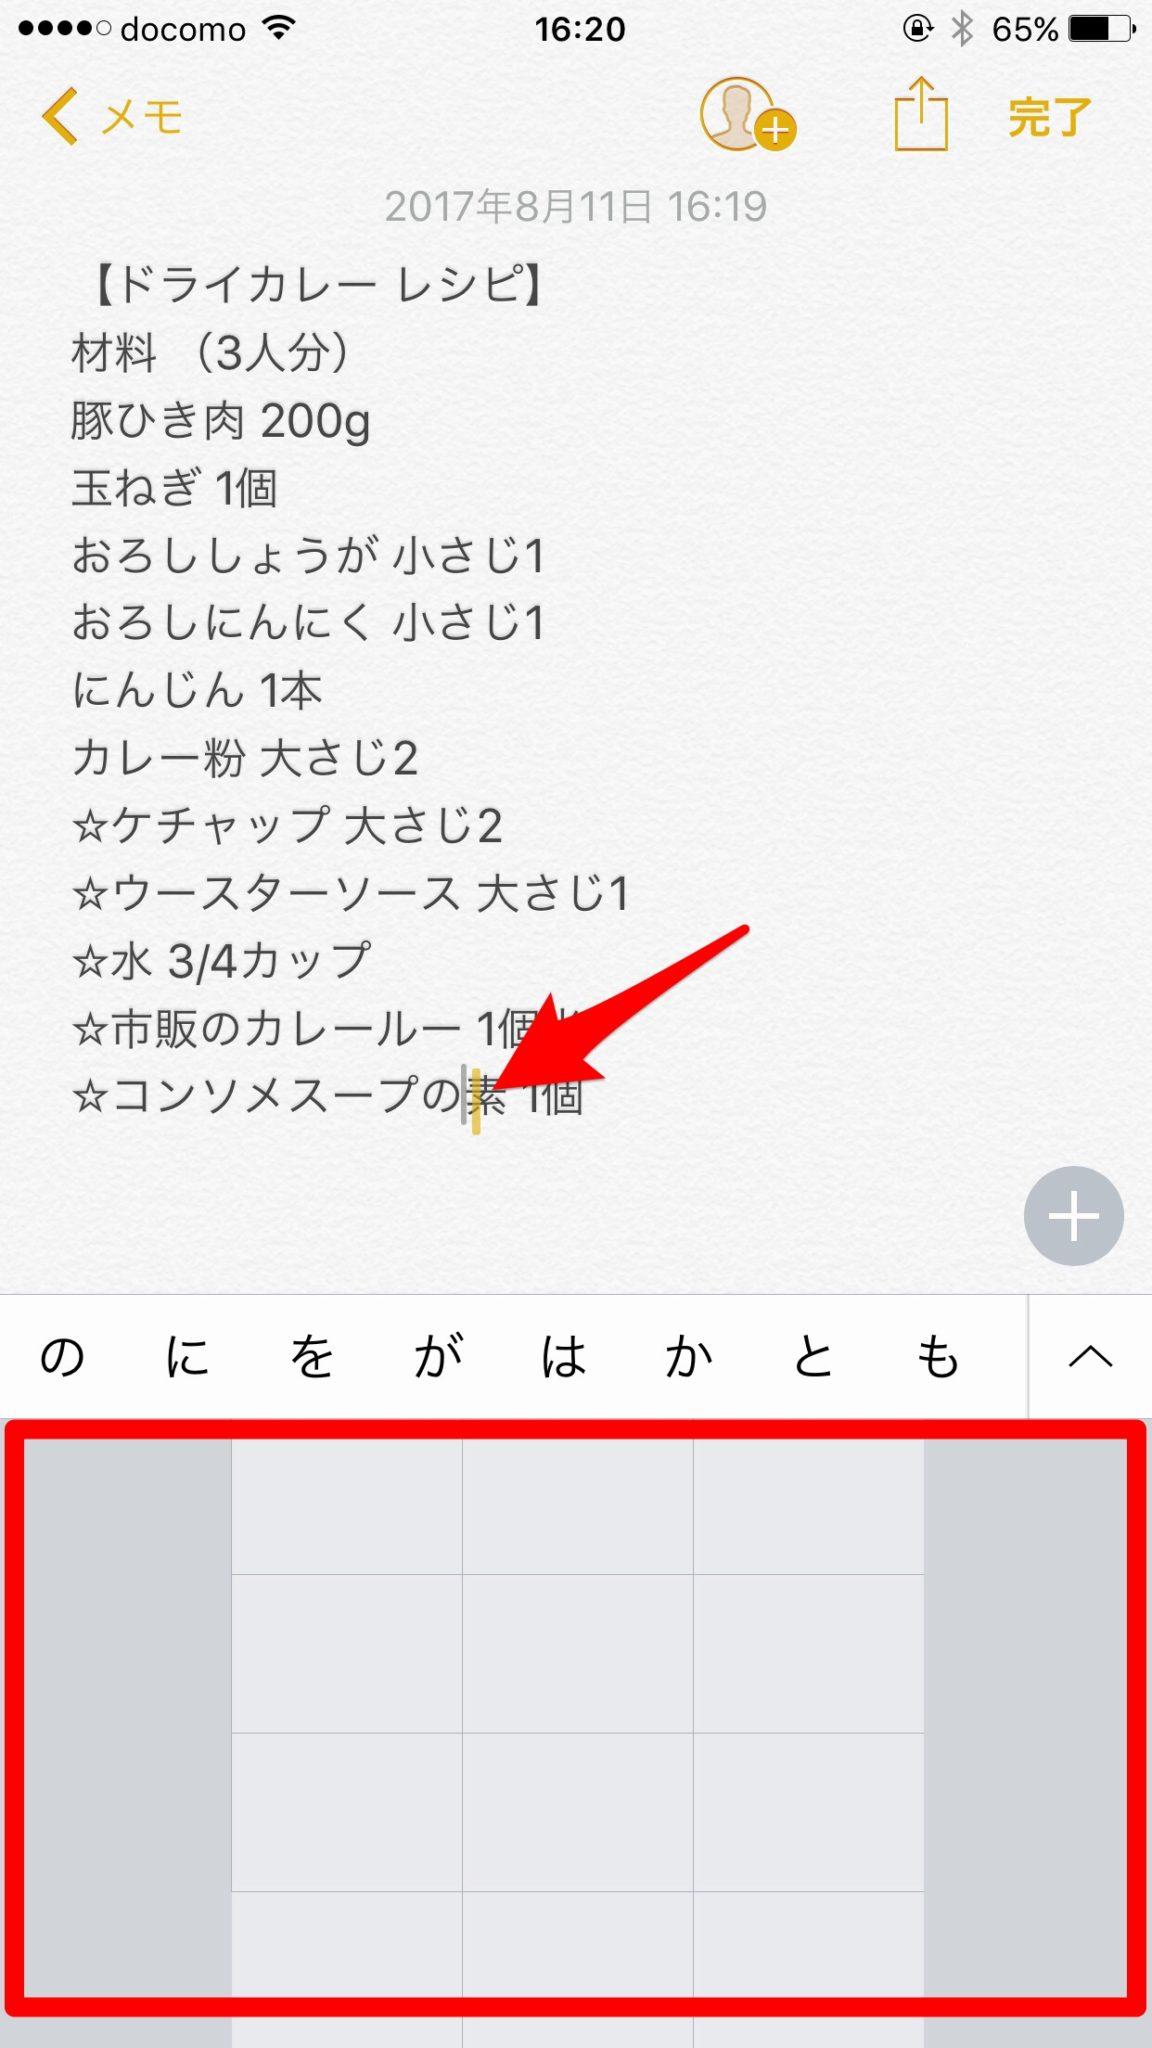 3D Touchを使って文字入力時のカーソル移動を便利にする方法